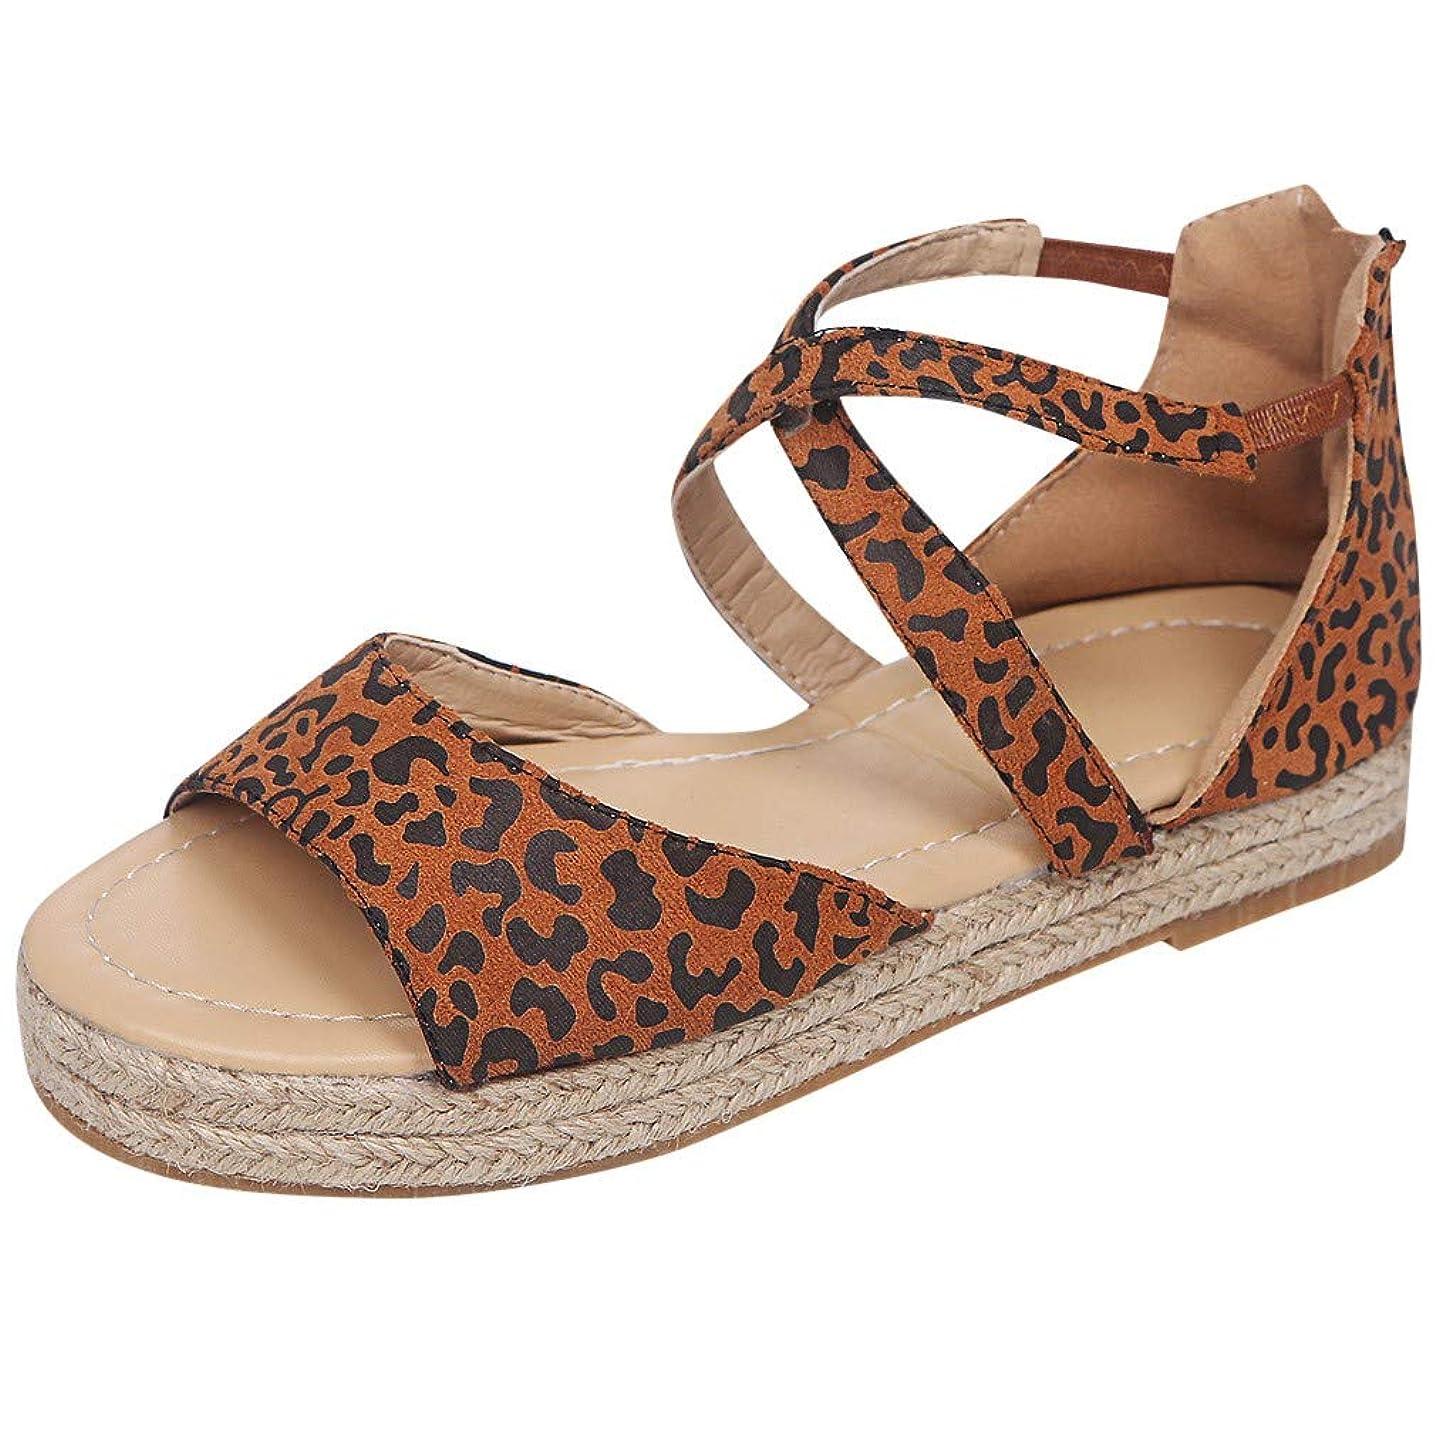 Nadition Women Sandals ??Leopard Print Espadrille Wedges Platform Sandals Retro Peep Toe Cross Strap Flat Sandals